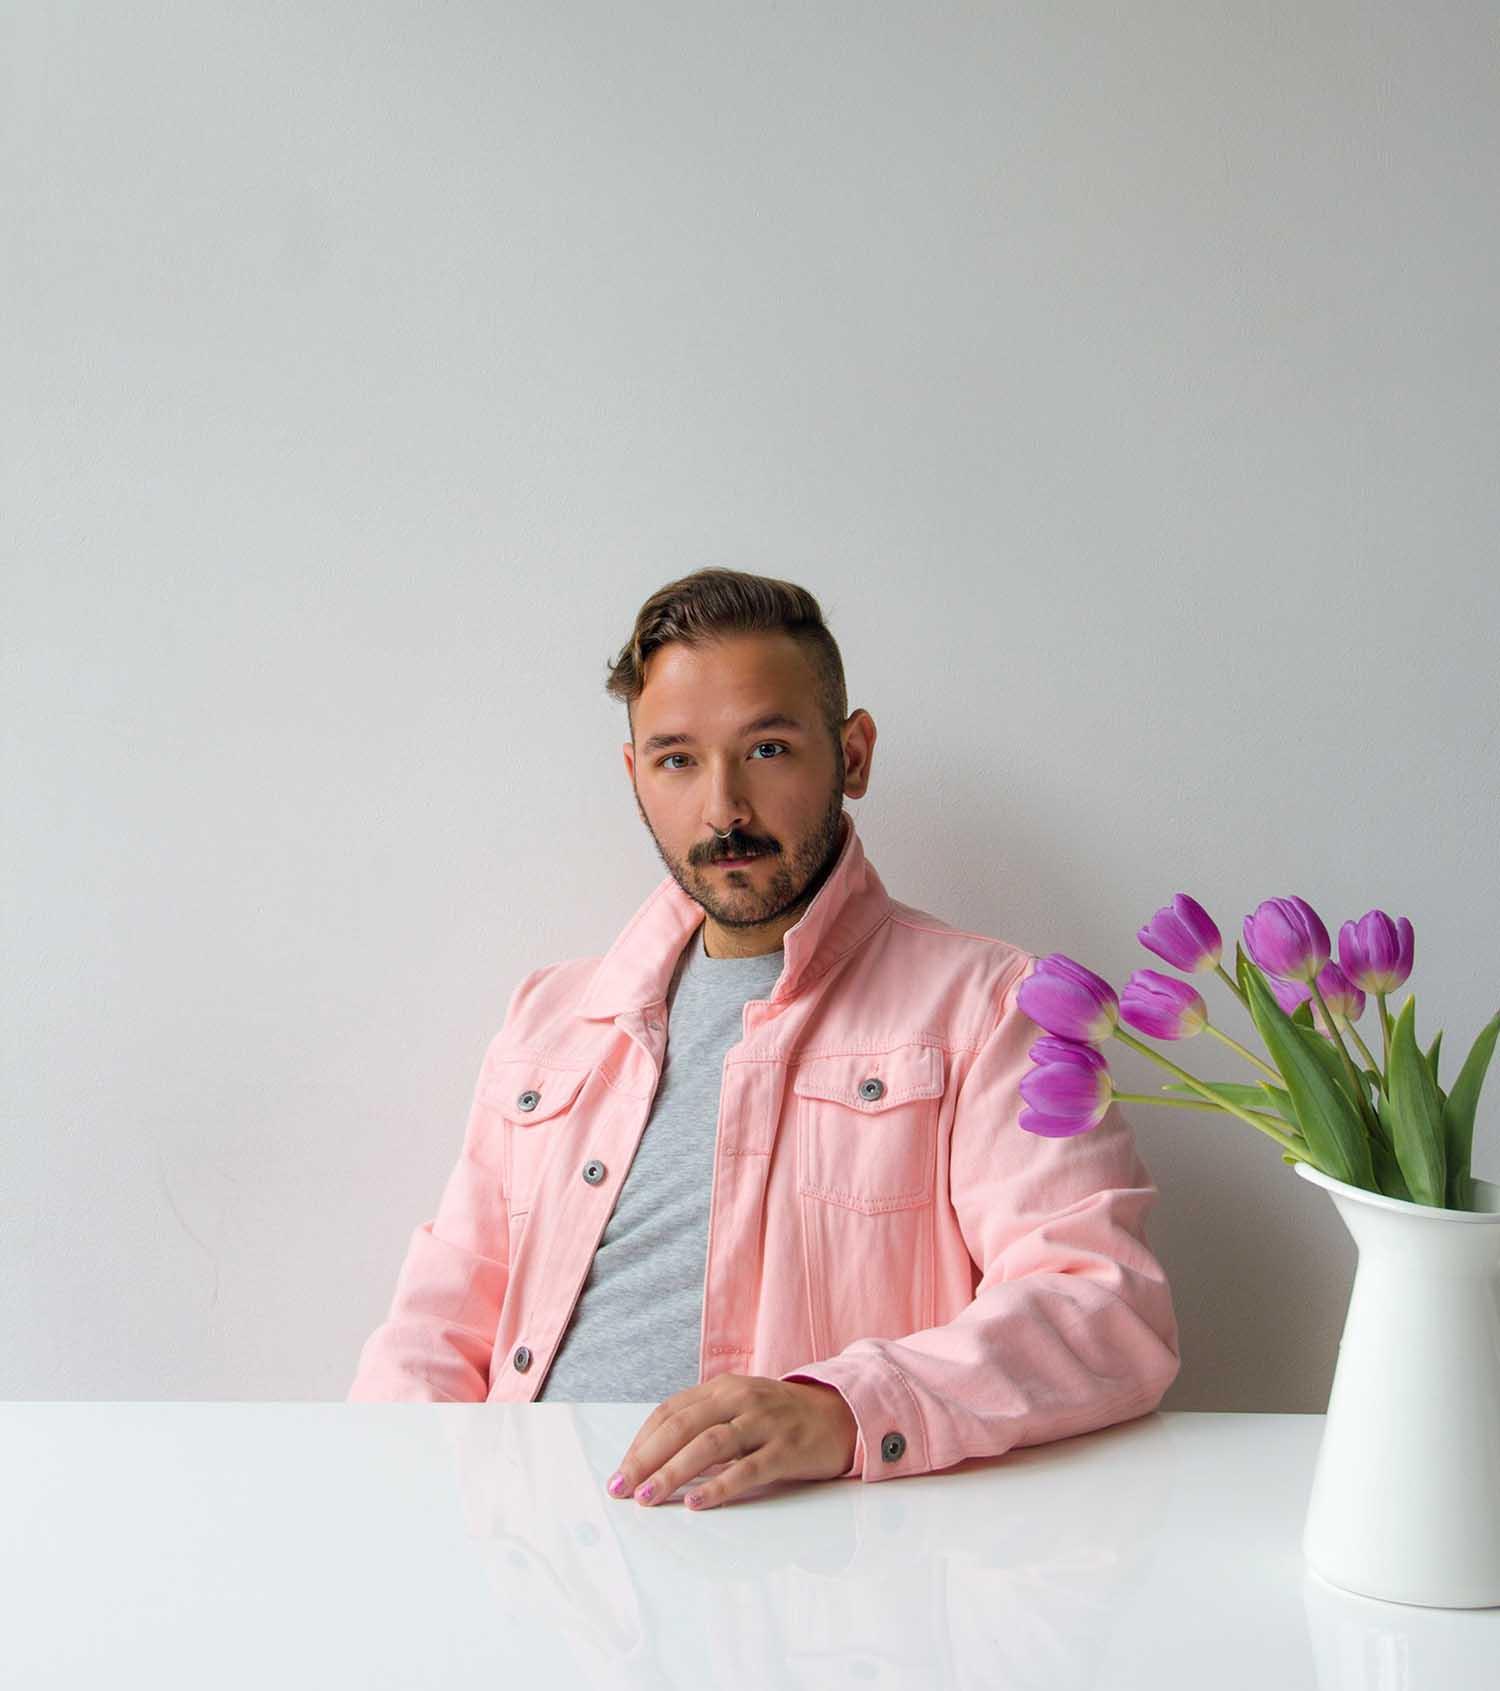 Home cooking creator Michael Chernak